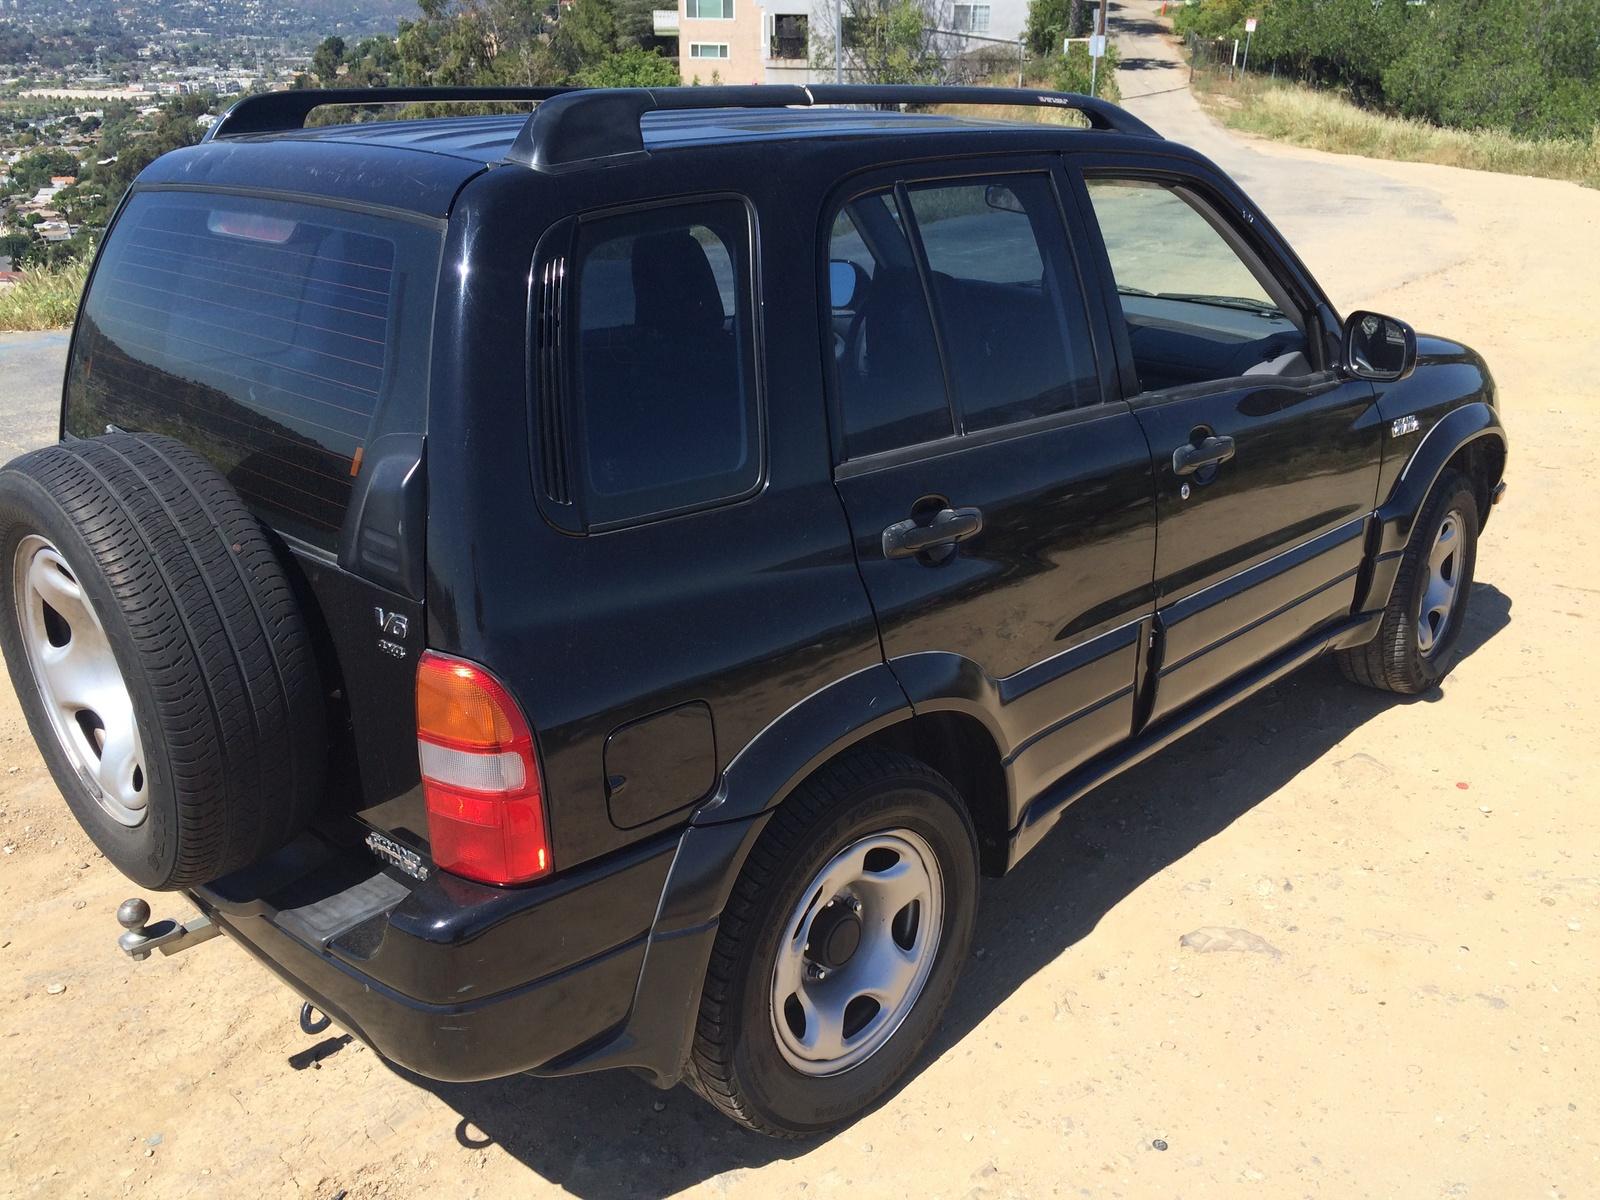 Picture of 2001 Suzuki Grand Vitara 4 Dr JLS Plus SE 4WD SUV